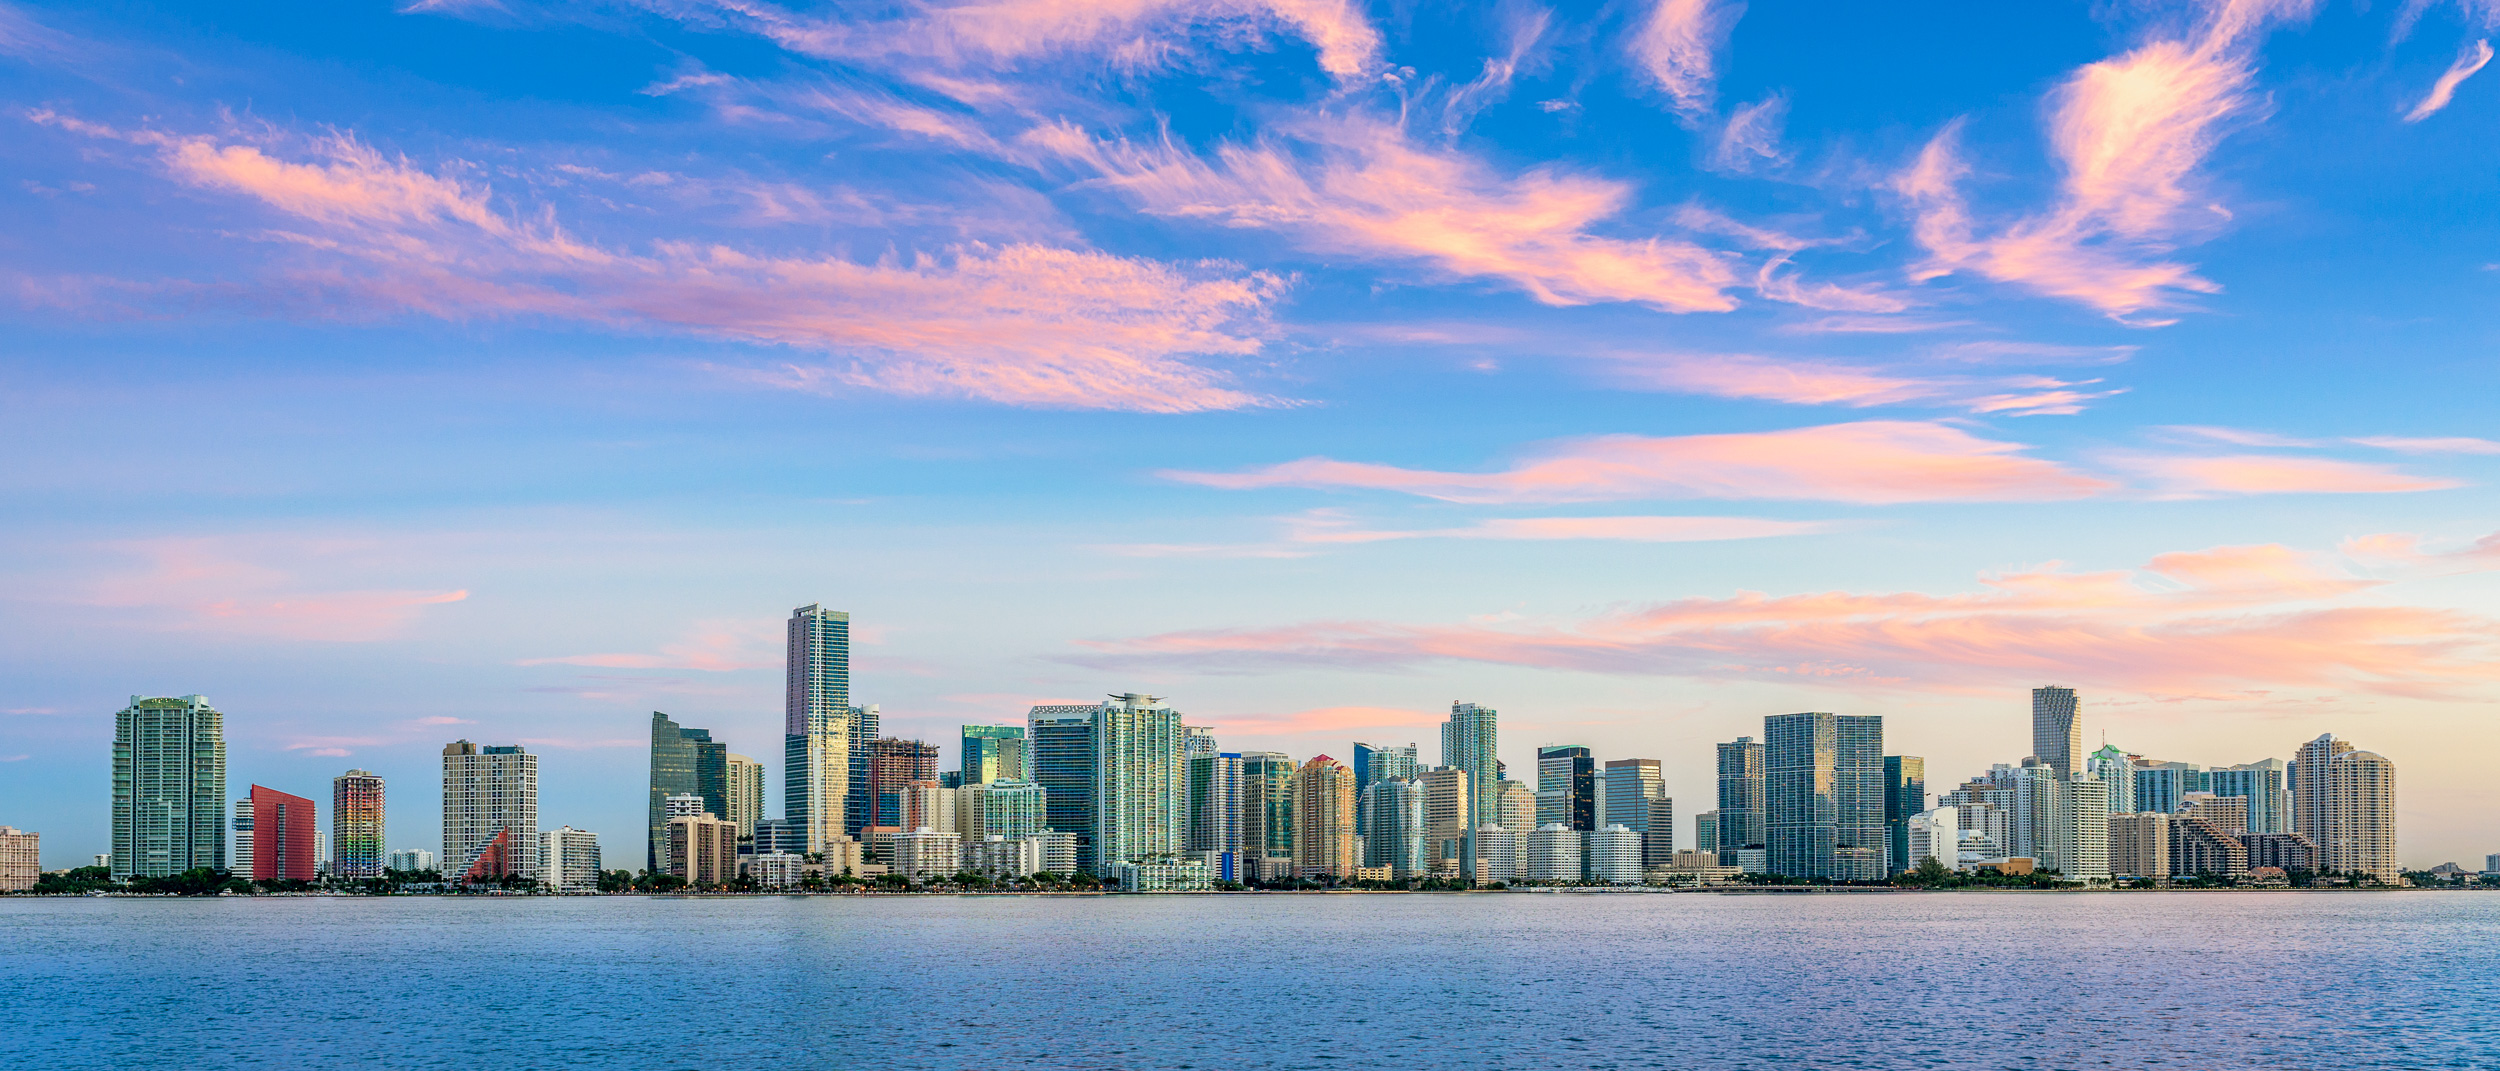 Miami_Skyline_Key_ Biscayne_franklin_Castillo-Edit.jpg